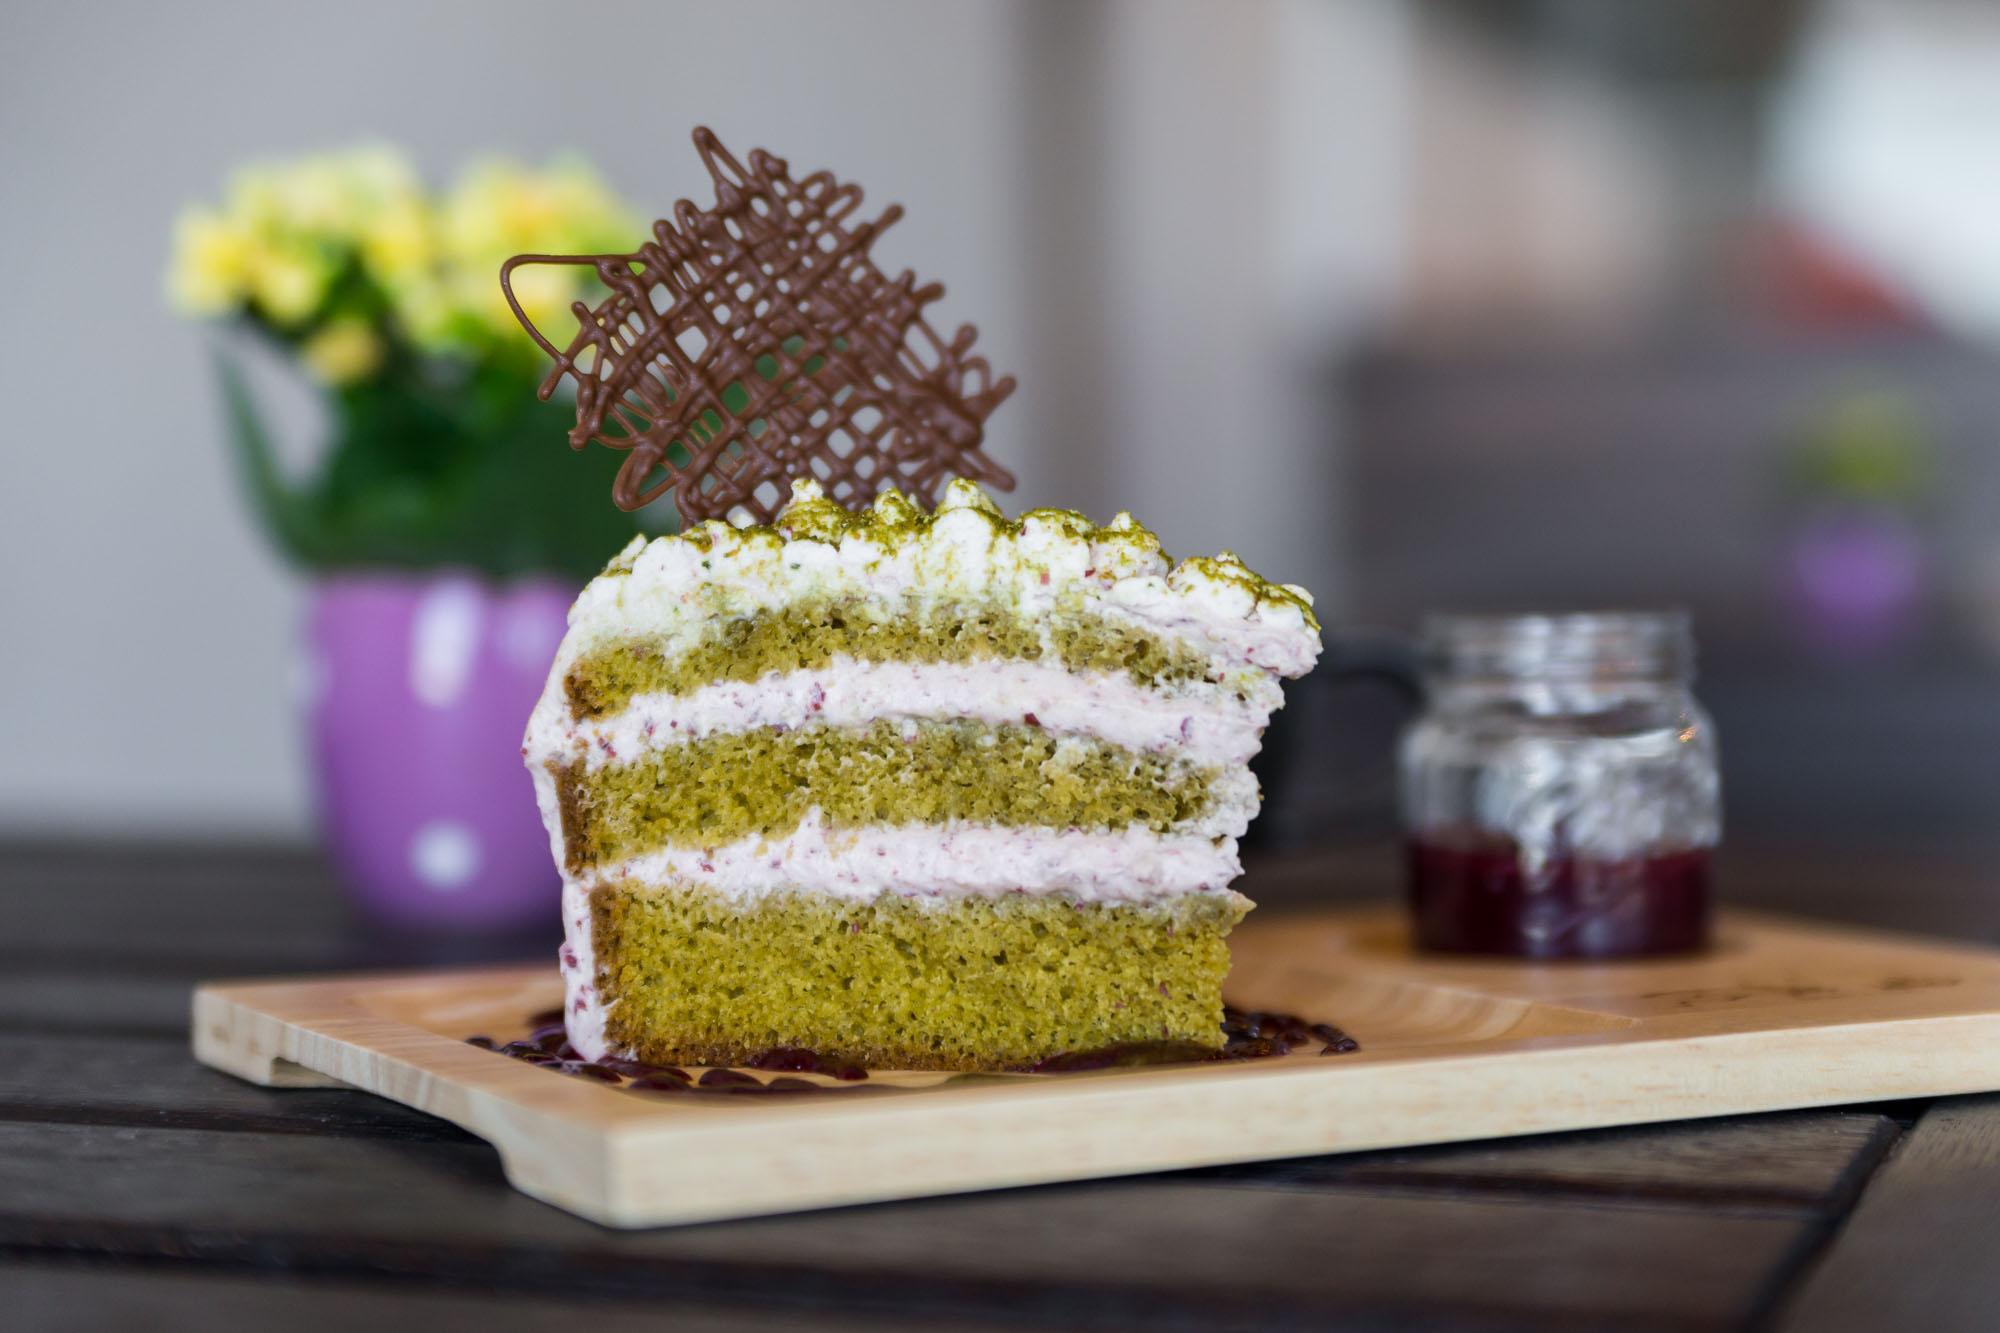 Your Favorite New Dessert Spot The Patio Eater Vegas